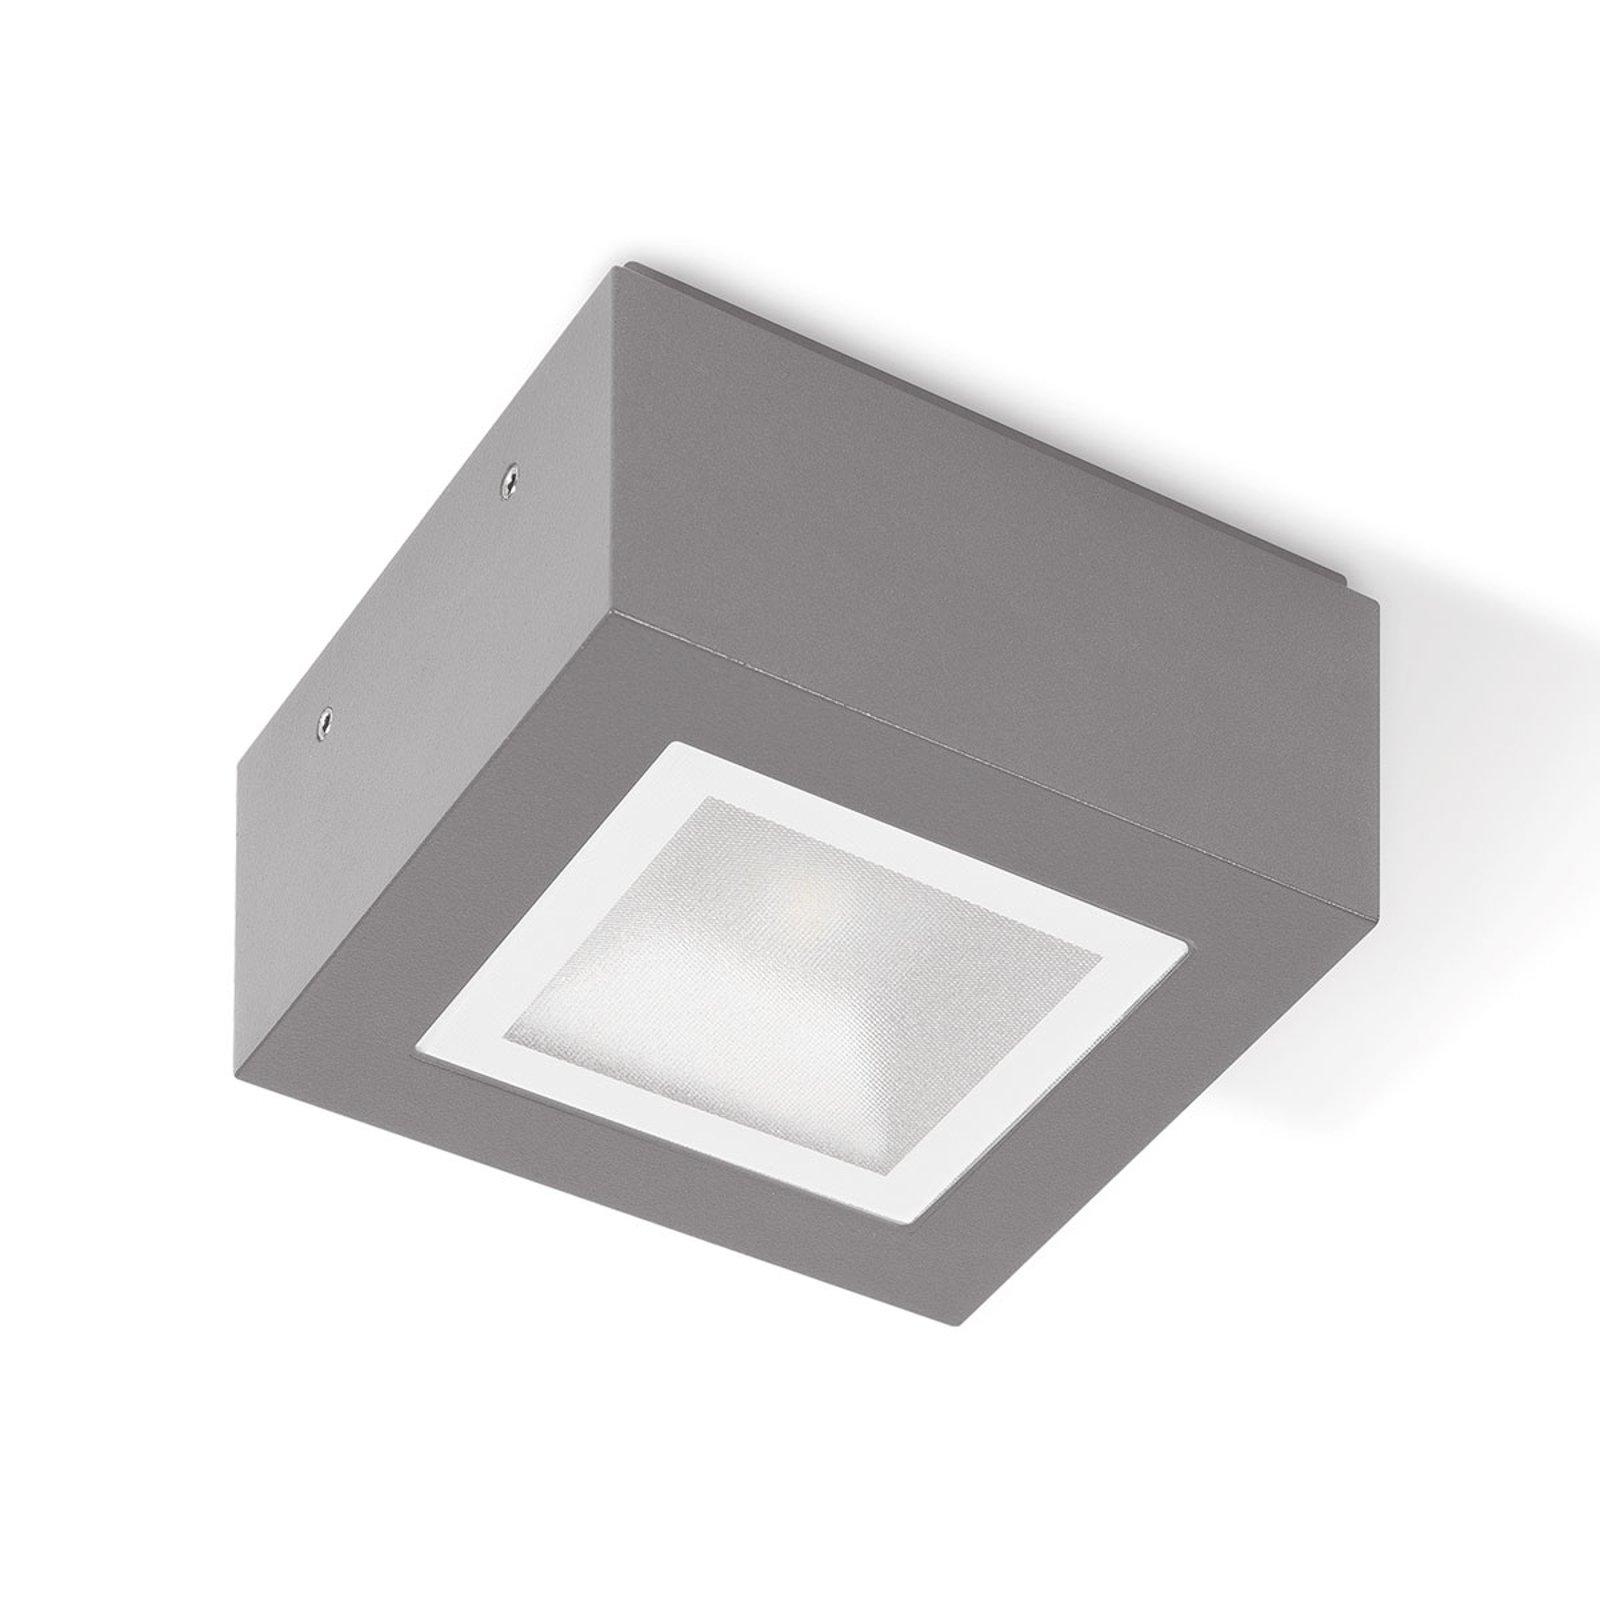 LED-taklampe Mimik 10 Tech Mikroprisma 4 000 K